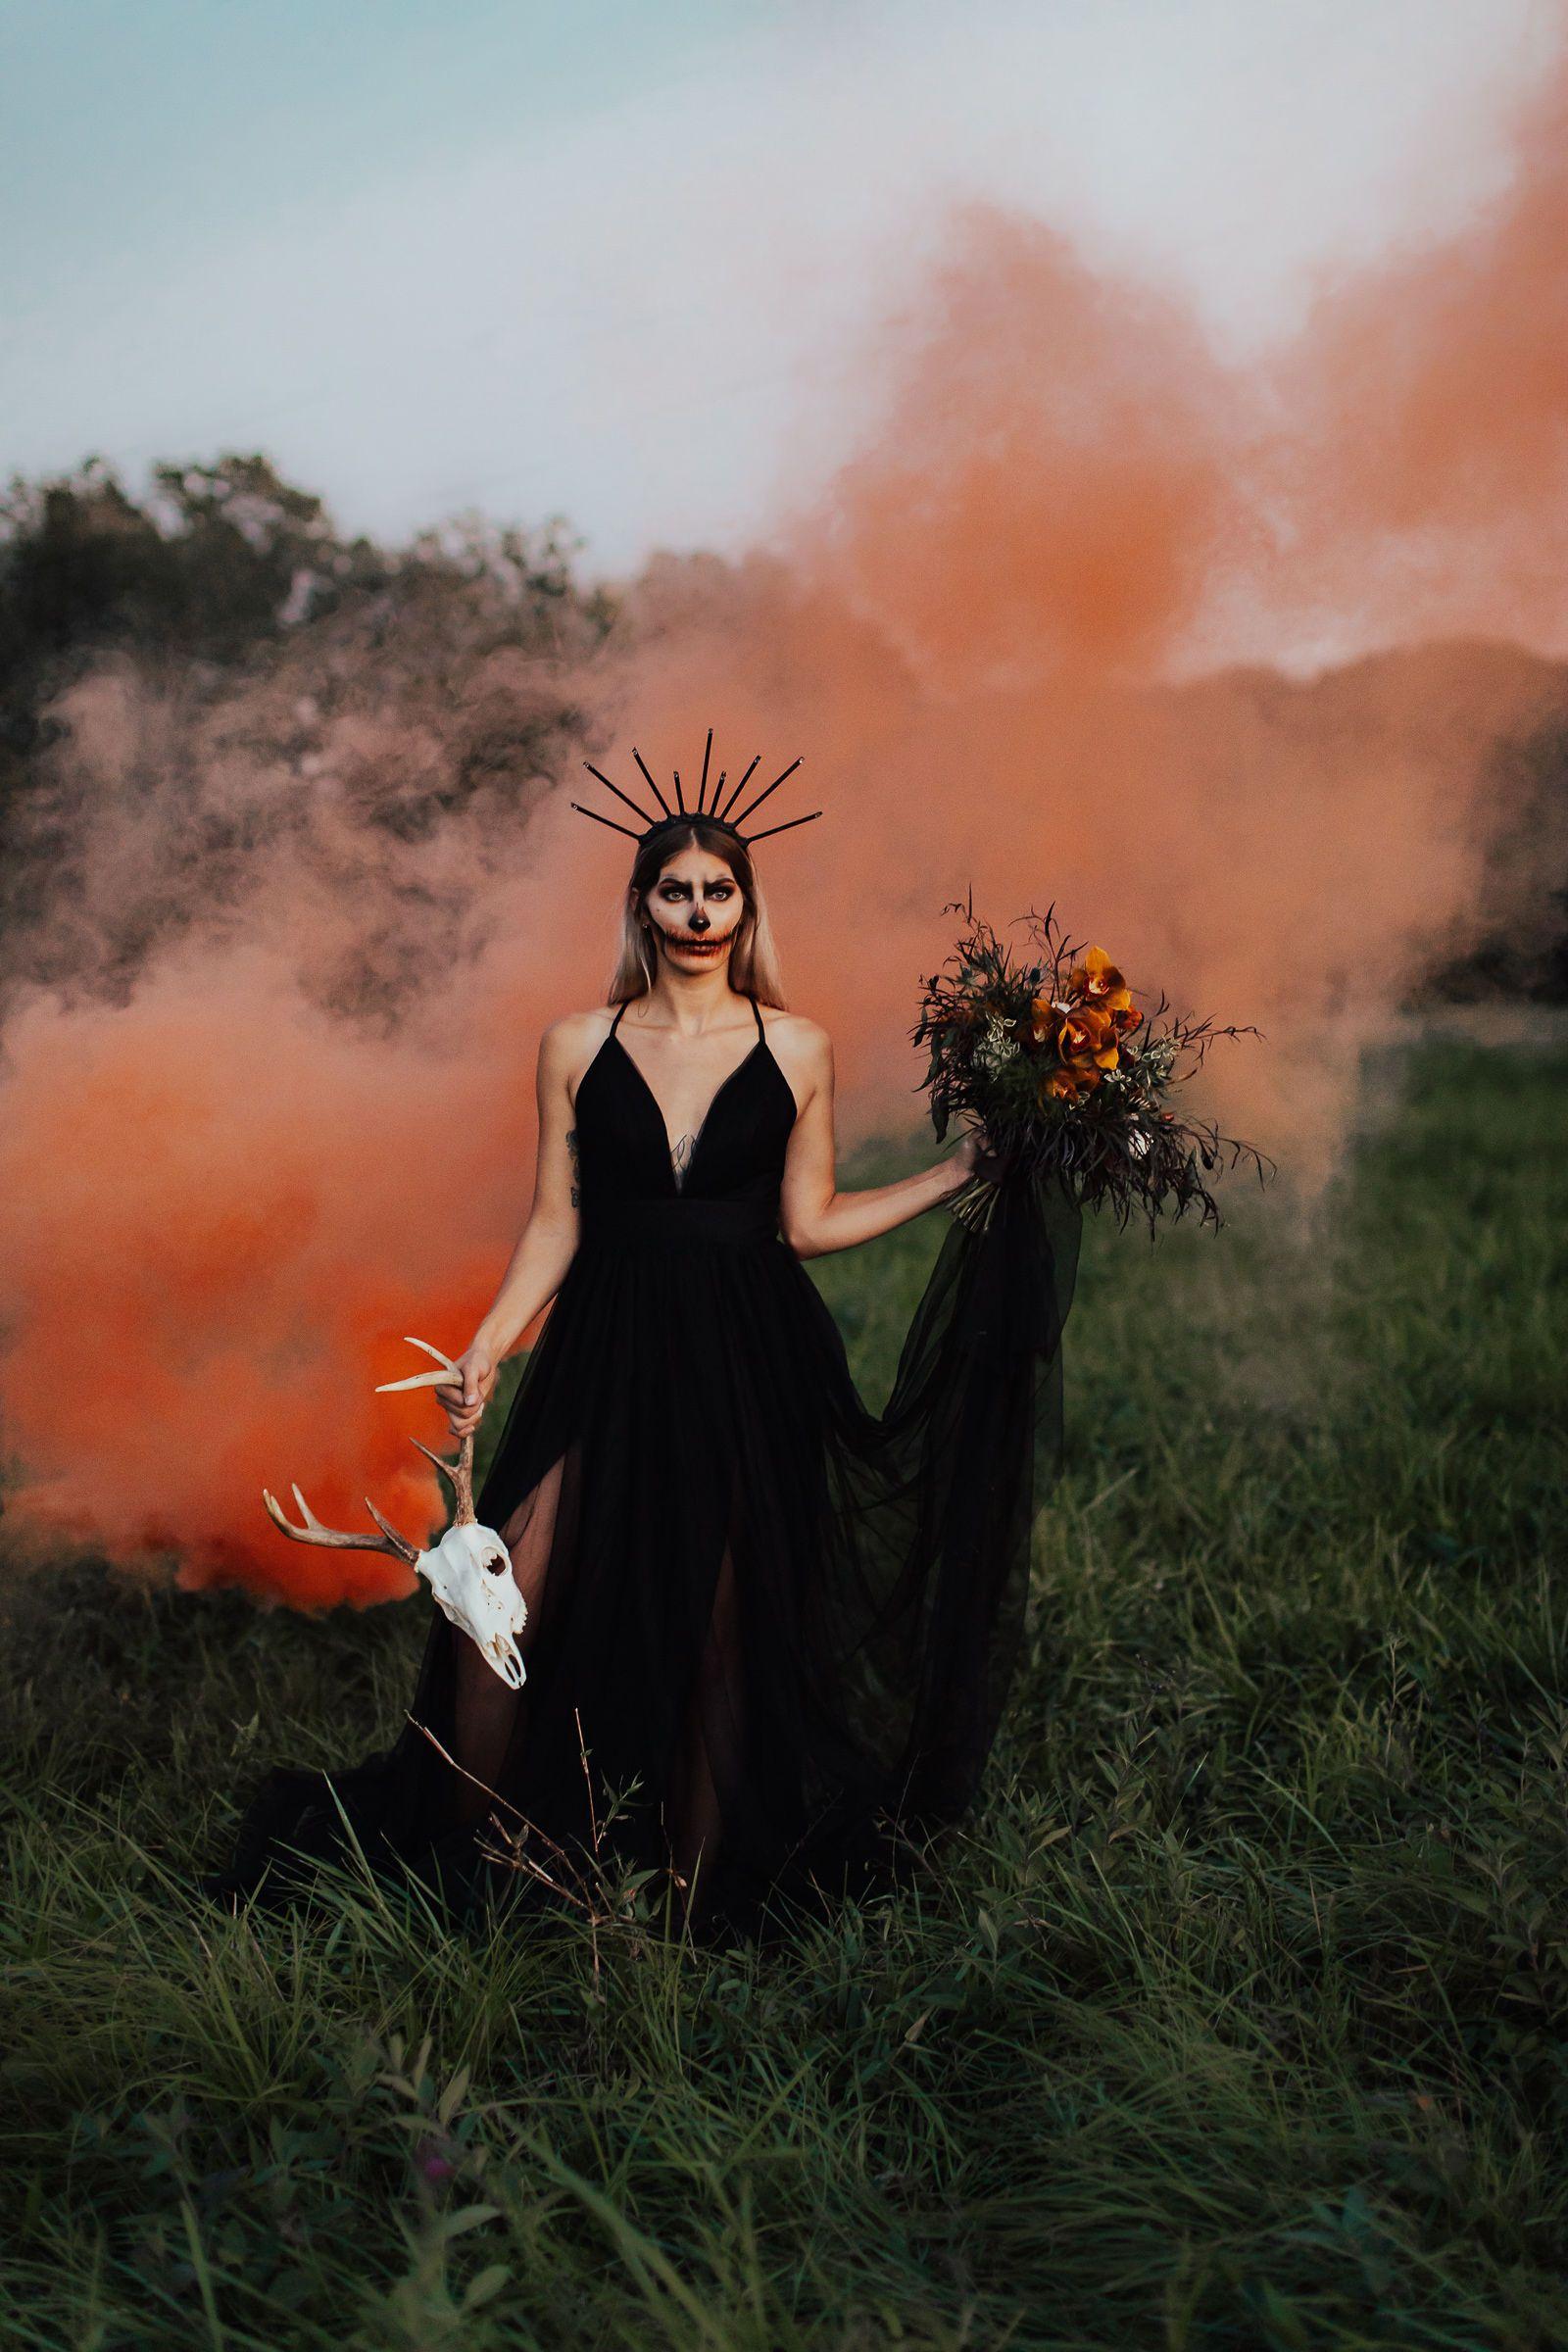 Halloween Photoshoot. Halloween Styled Shoot. Spooky